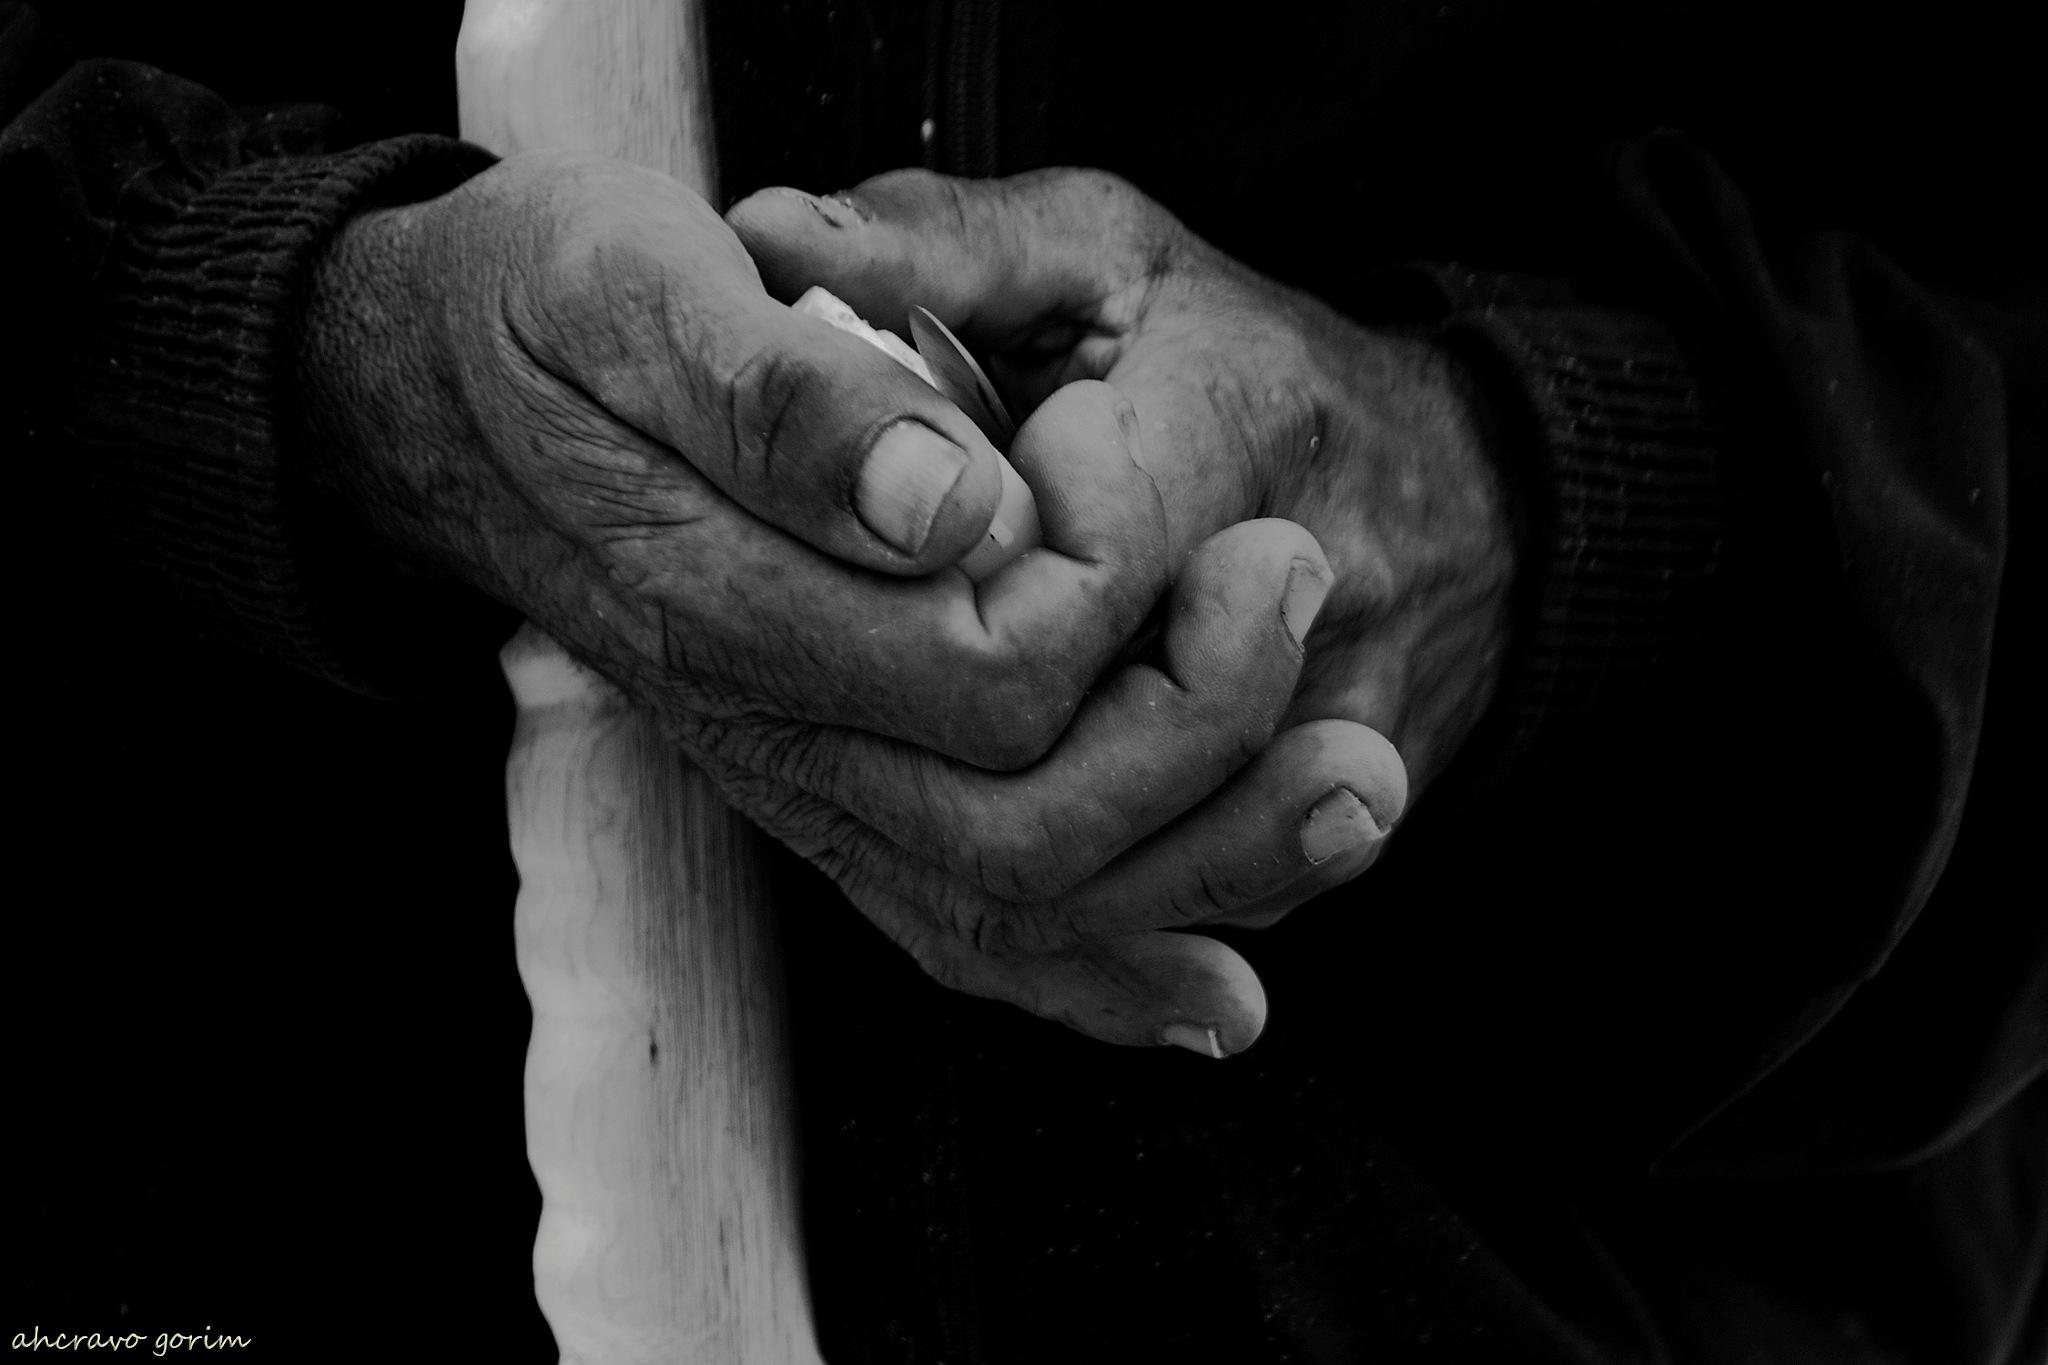 sea hands (12) by ahcravo gorim